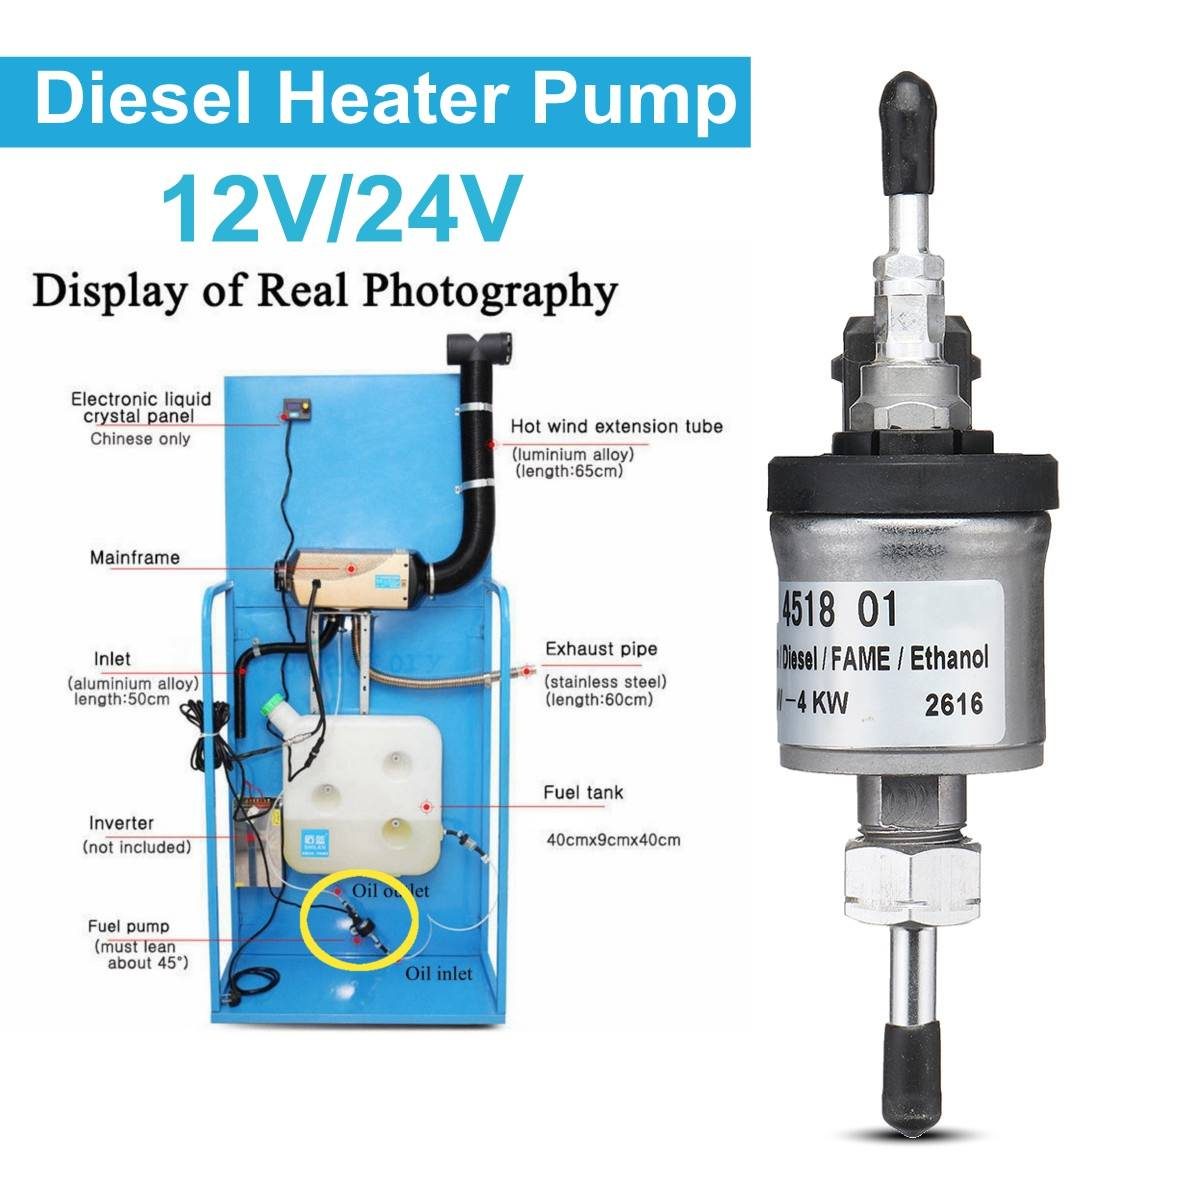 12 V/24 V 10A 22Mpa 1000 W-8000 W Voor Eberspacher Elektrische Kachel Olie Brandstofpomp Air parking Heater Auto Styling Accessoires